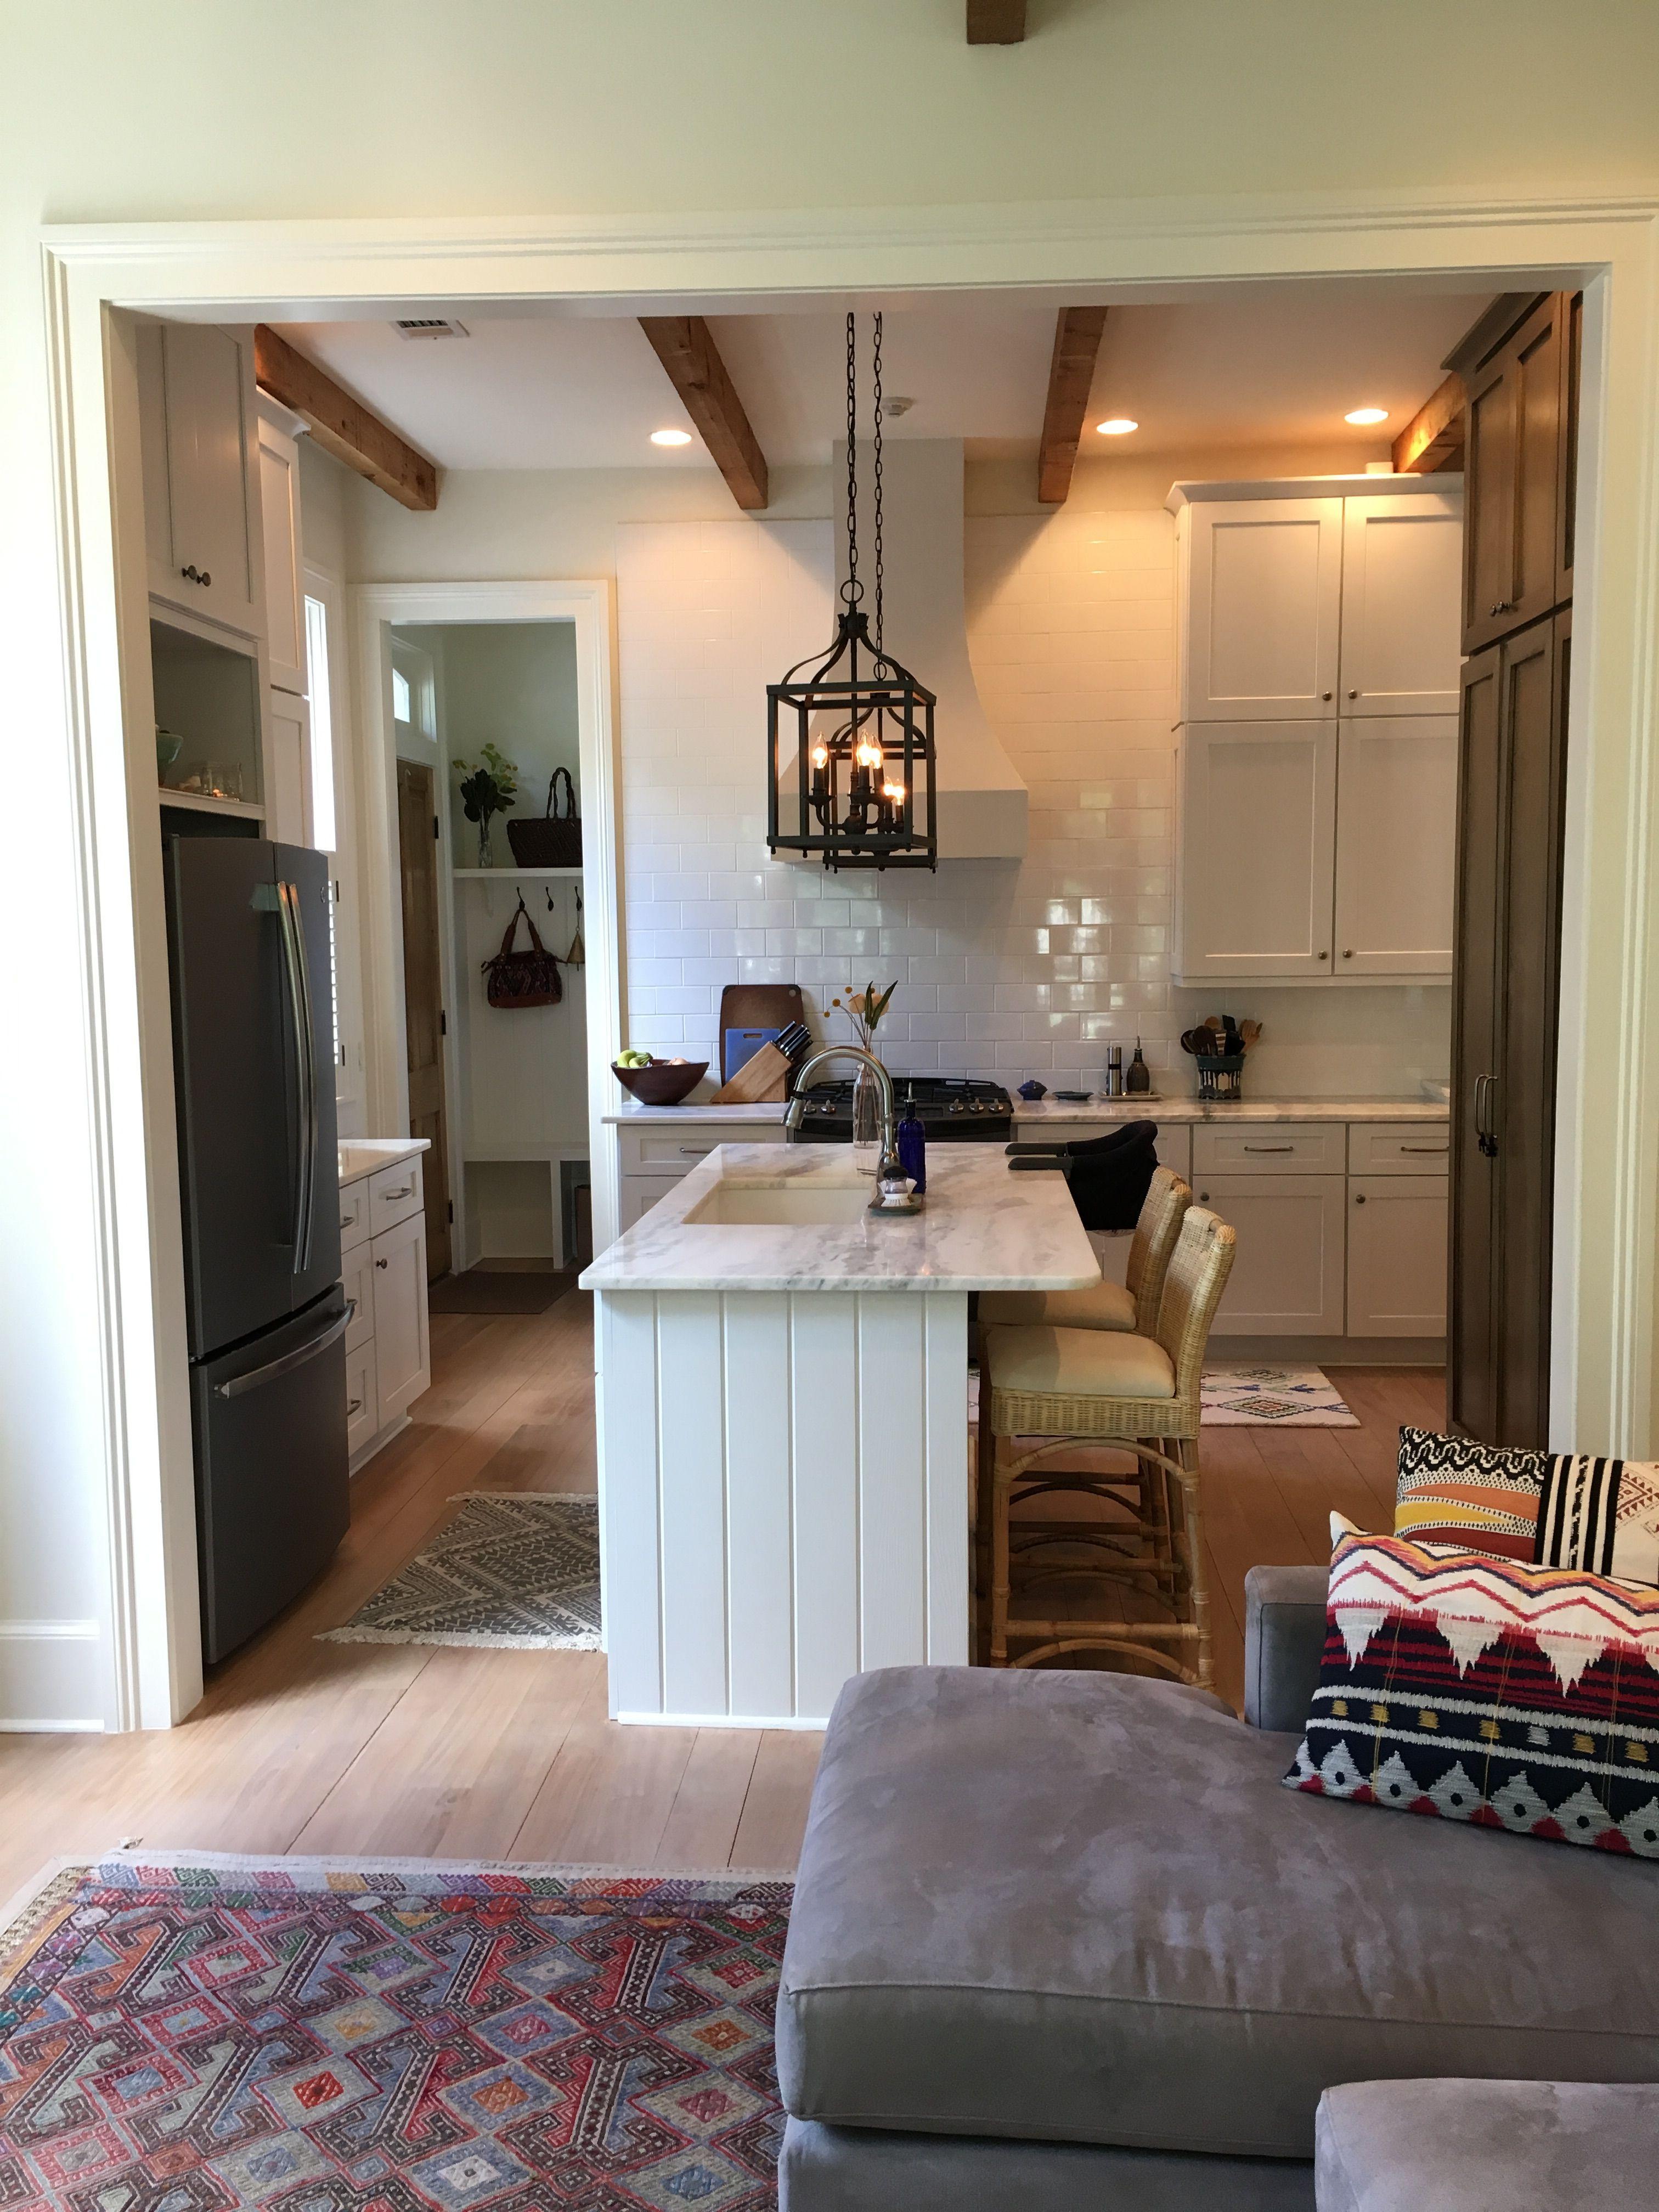 Benjamin Moore Acadia White Ac 41 4x8 Subway Tile Mont Blanc Quartzite Kitchen Cabinets Kitchen White Kitchen Cabinets